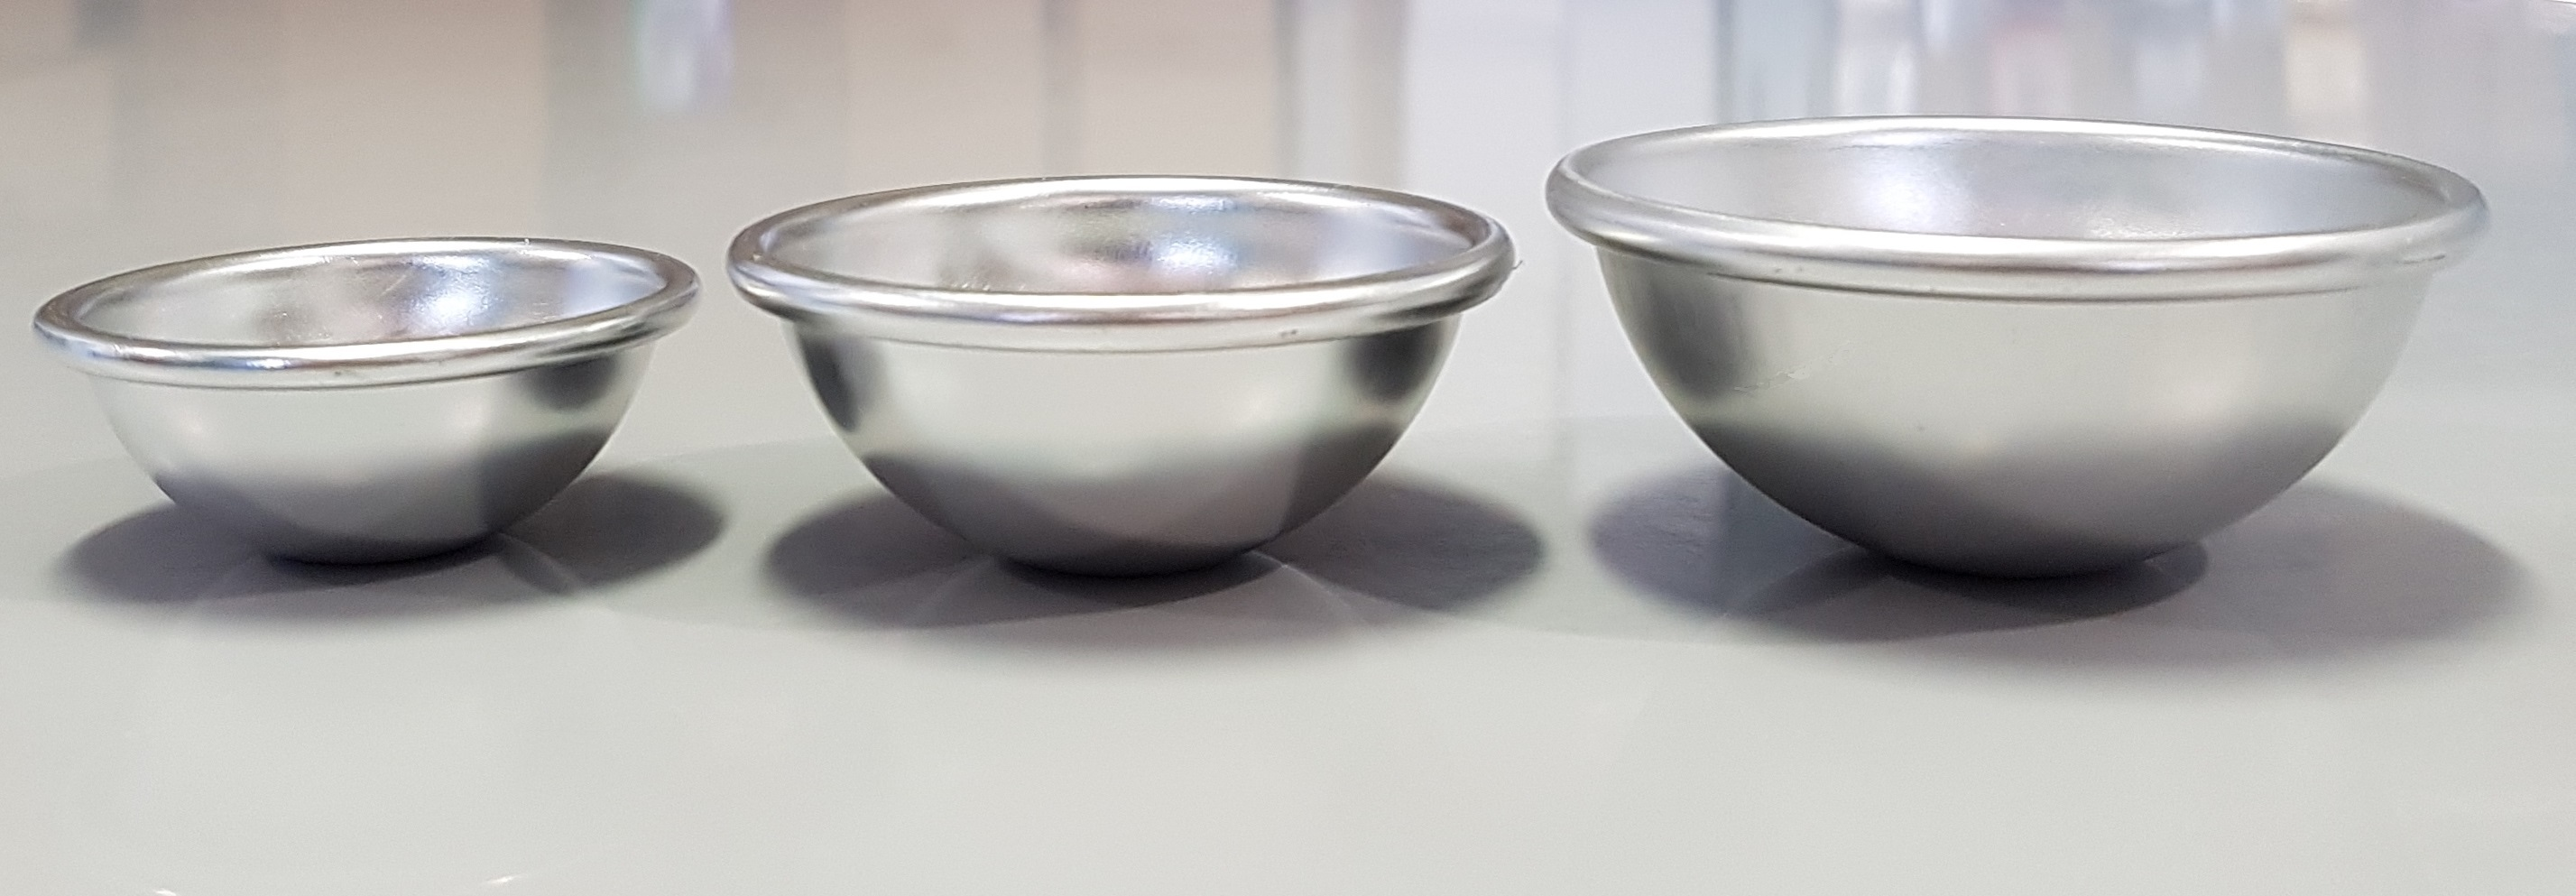 Small Bowl Set (65mm, 55mm & 45mm dia.).3